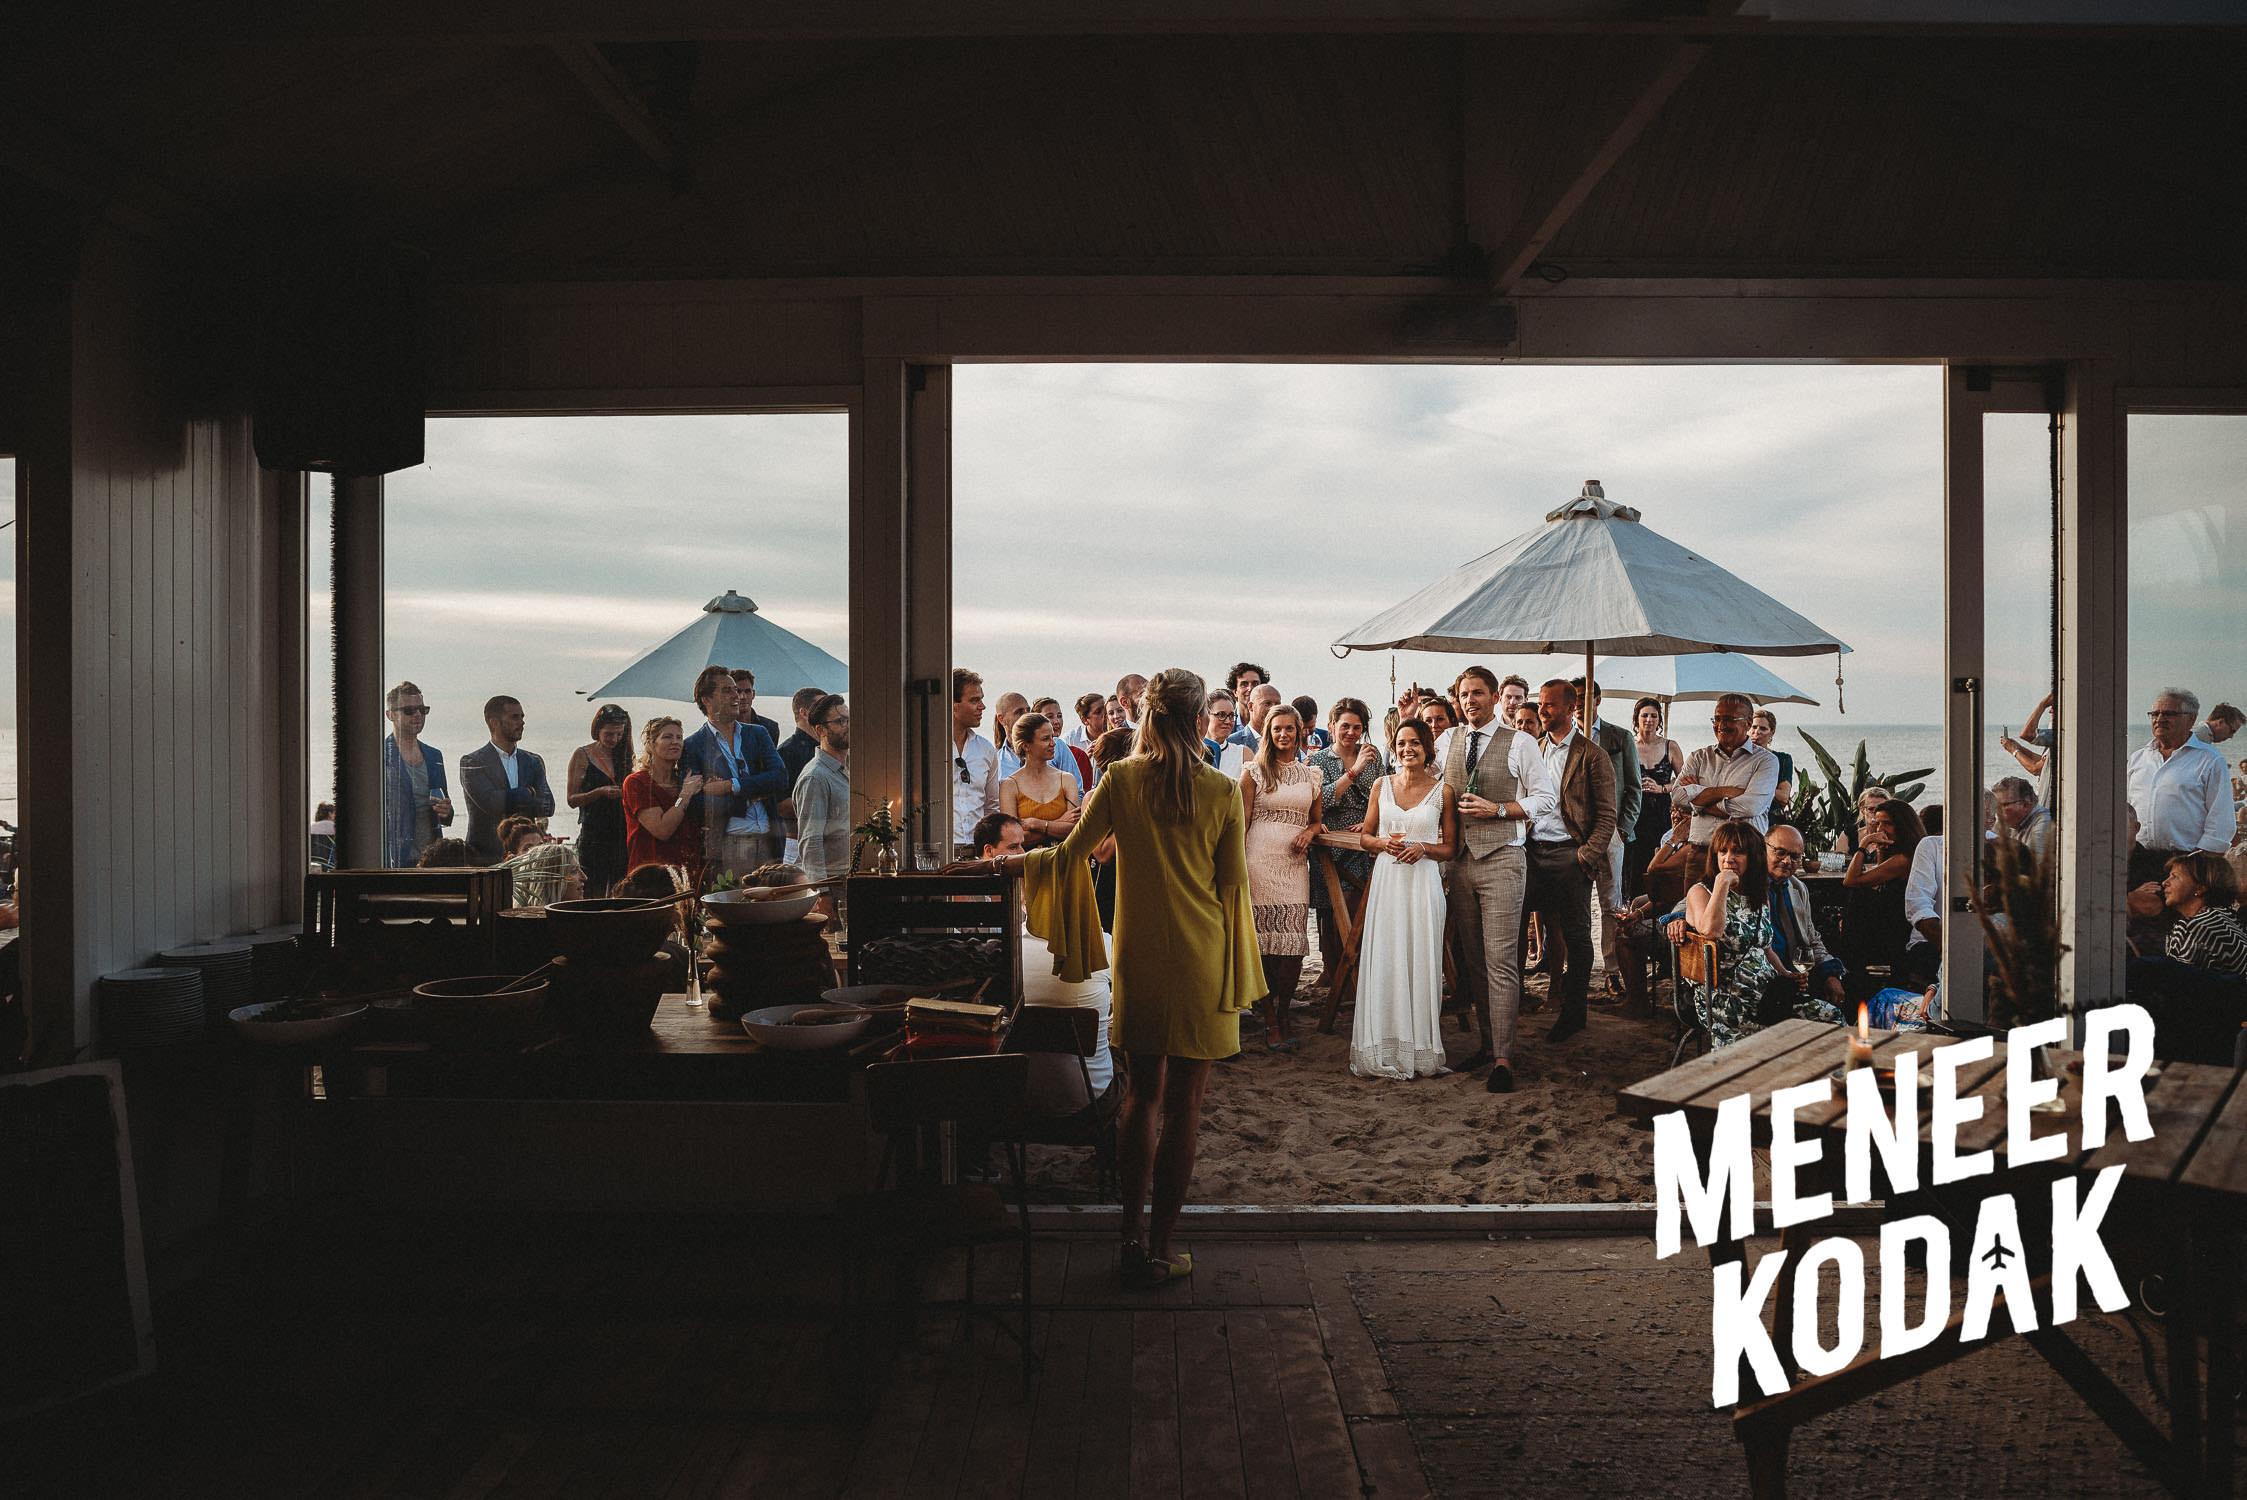 Meneer Kodak - Strandbruiloft - Noordwijk - K&A-117.jpg